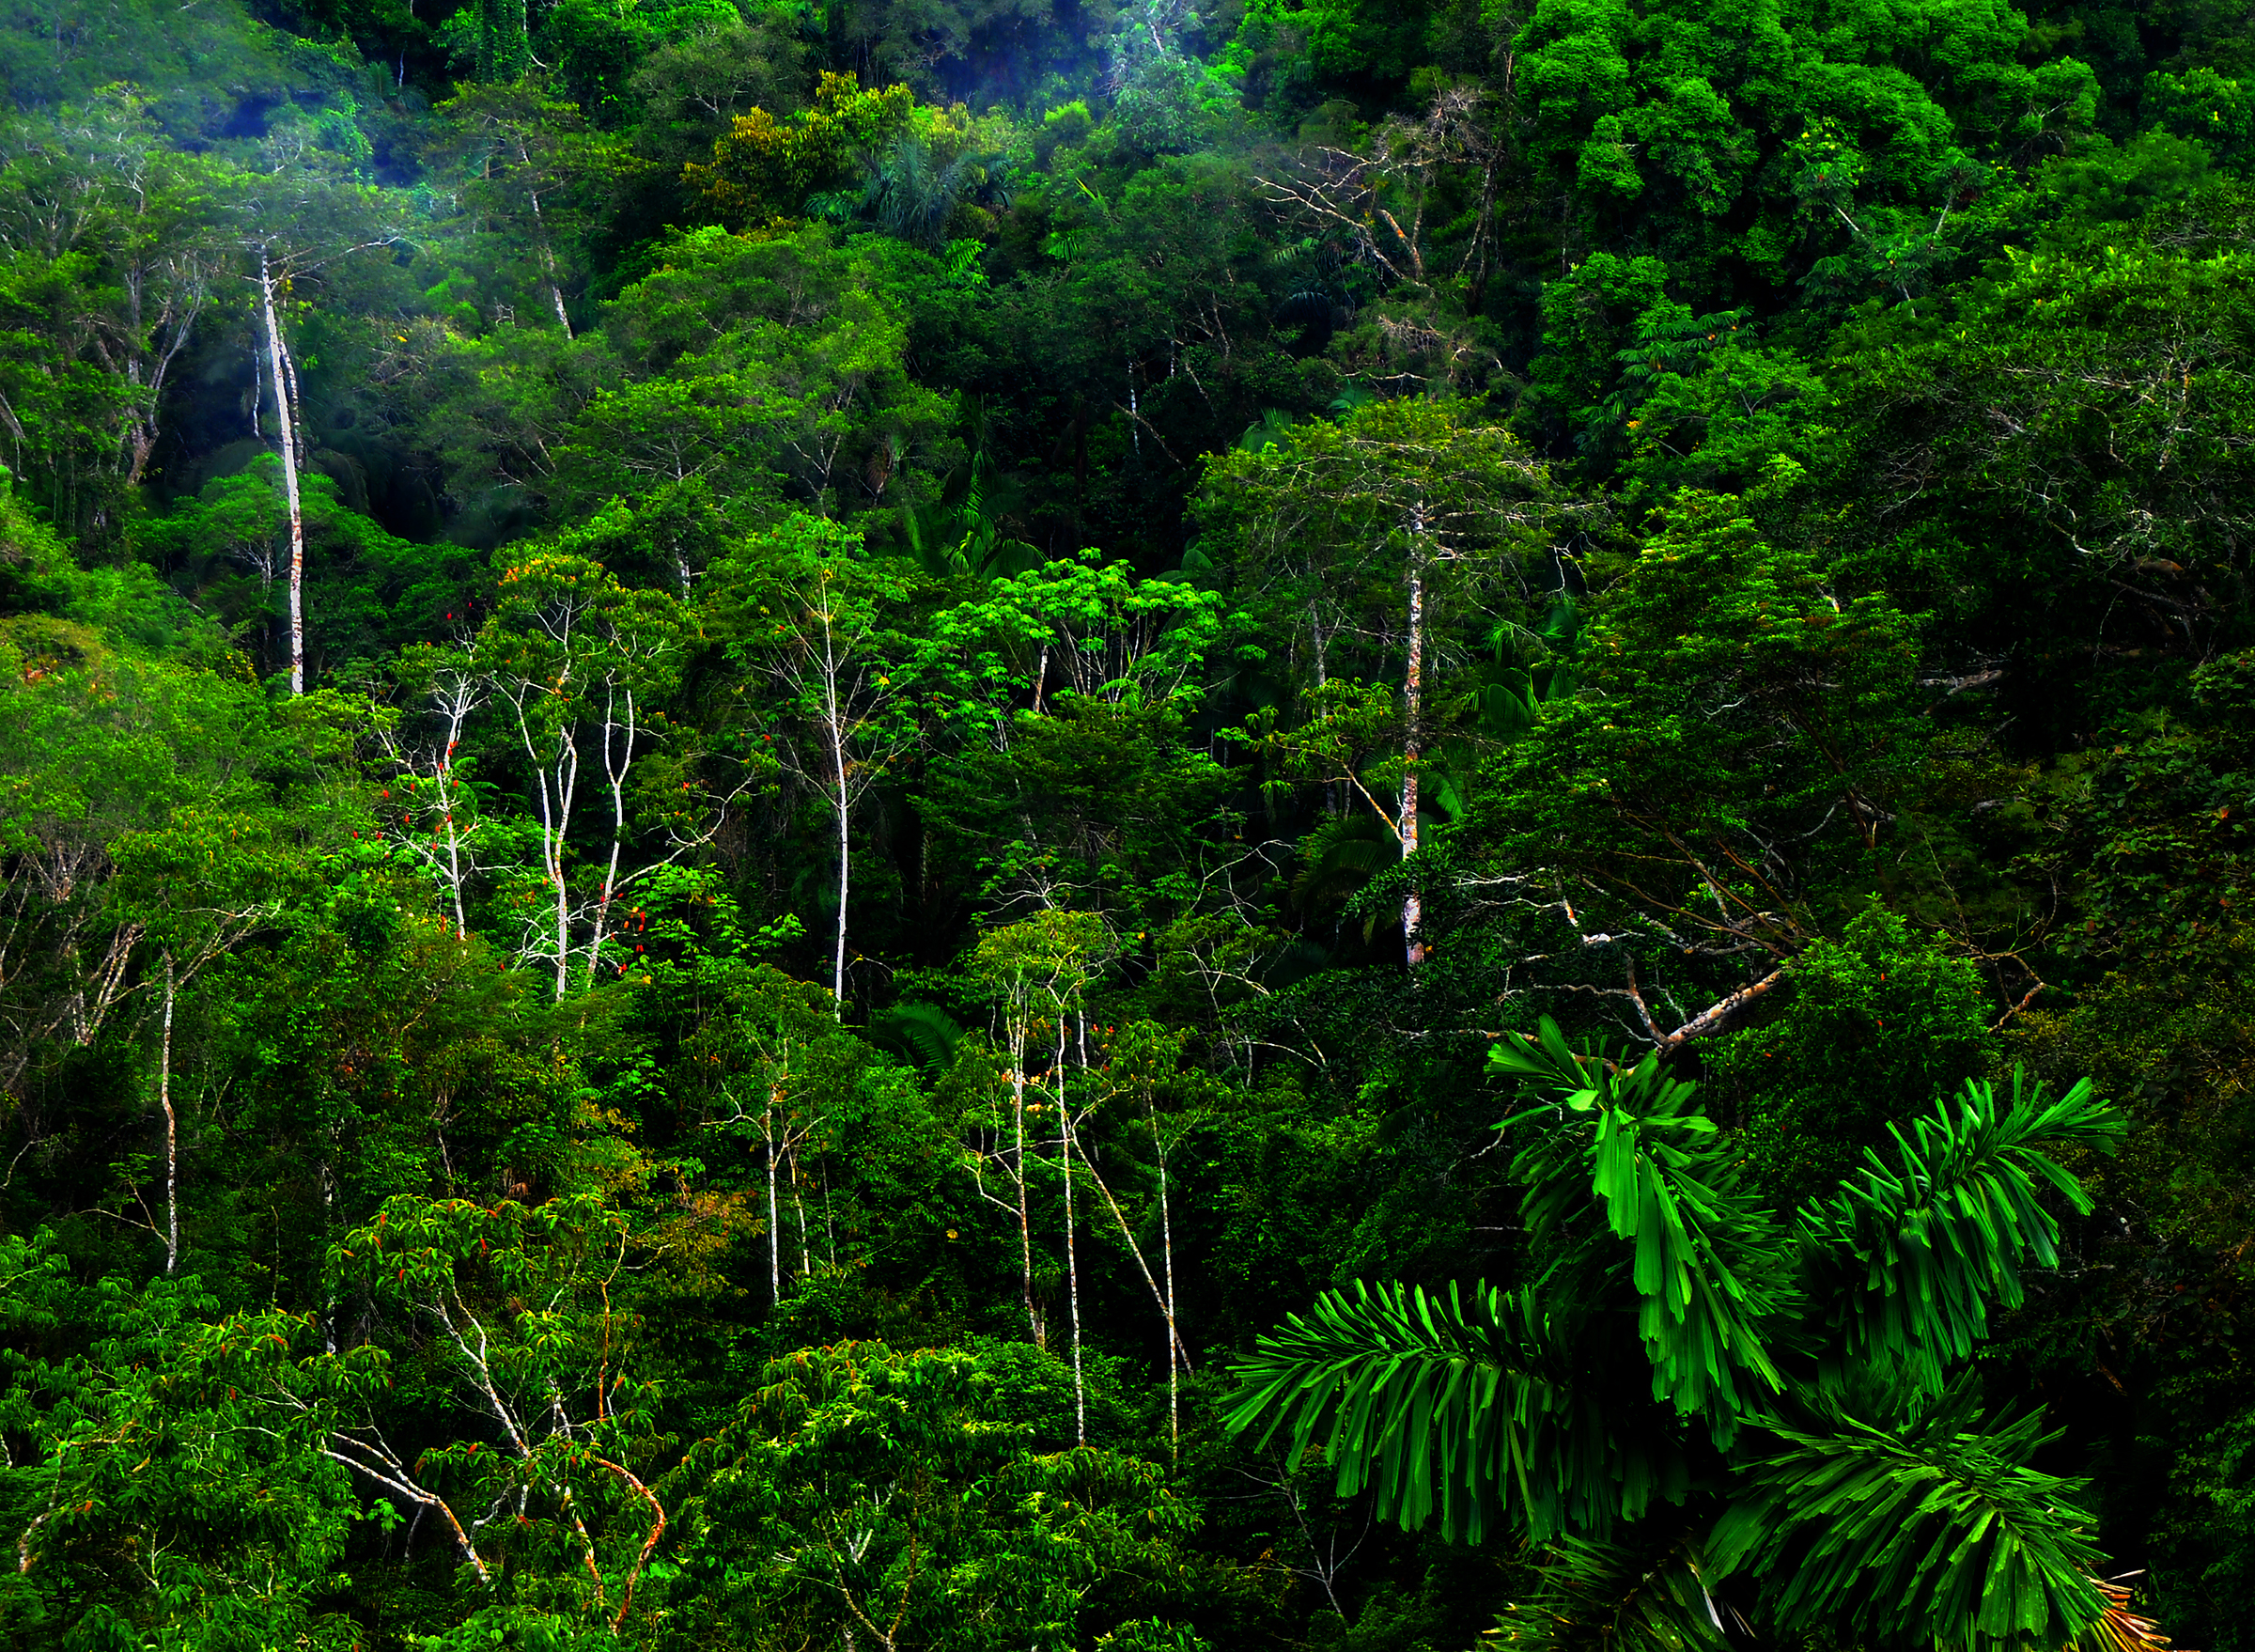 tropical rainforest: tropical rainforest | Glogster EDU